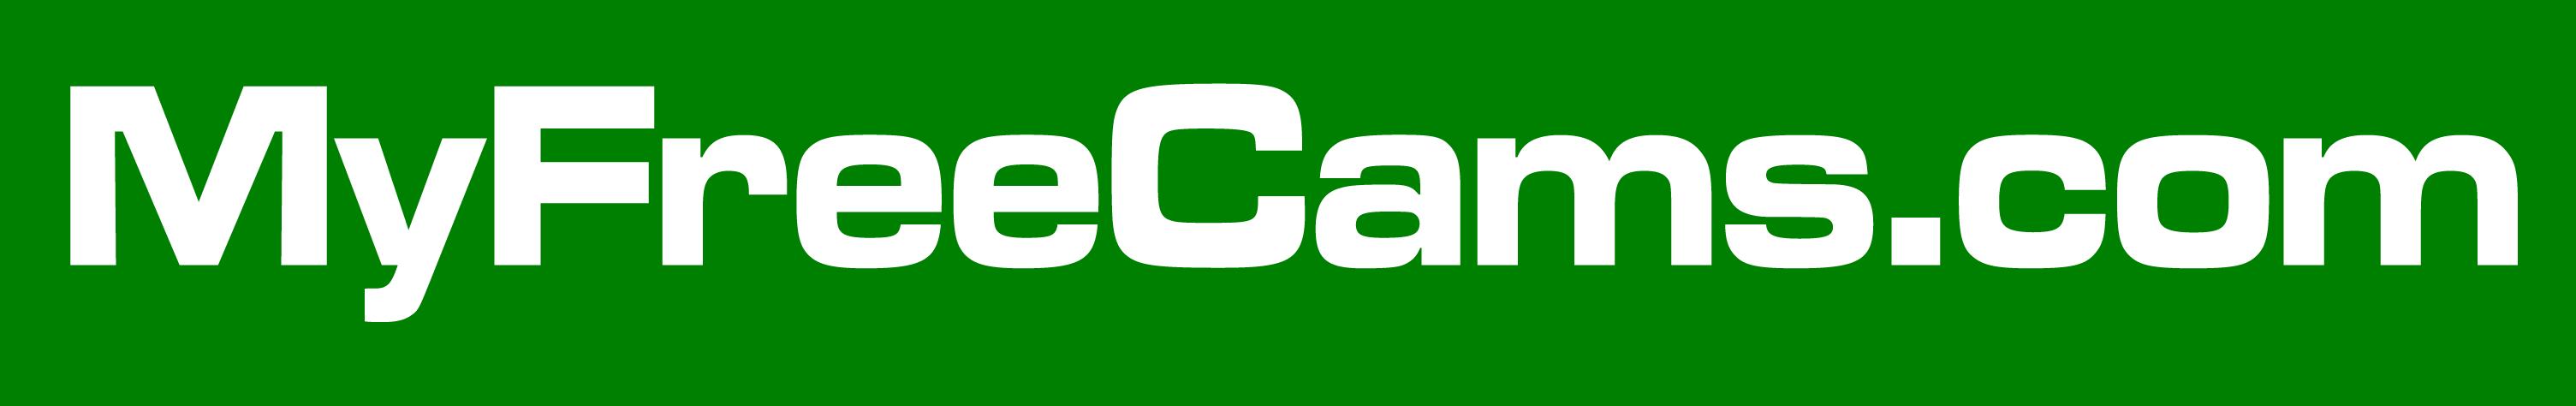 myfreecams logo